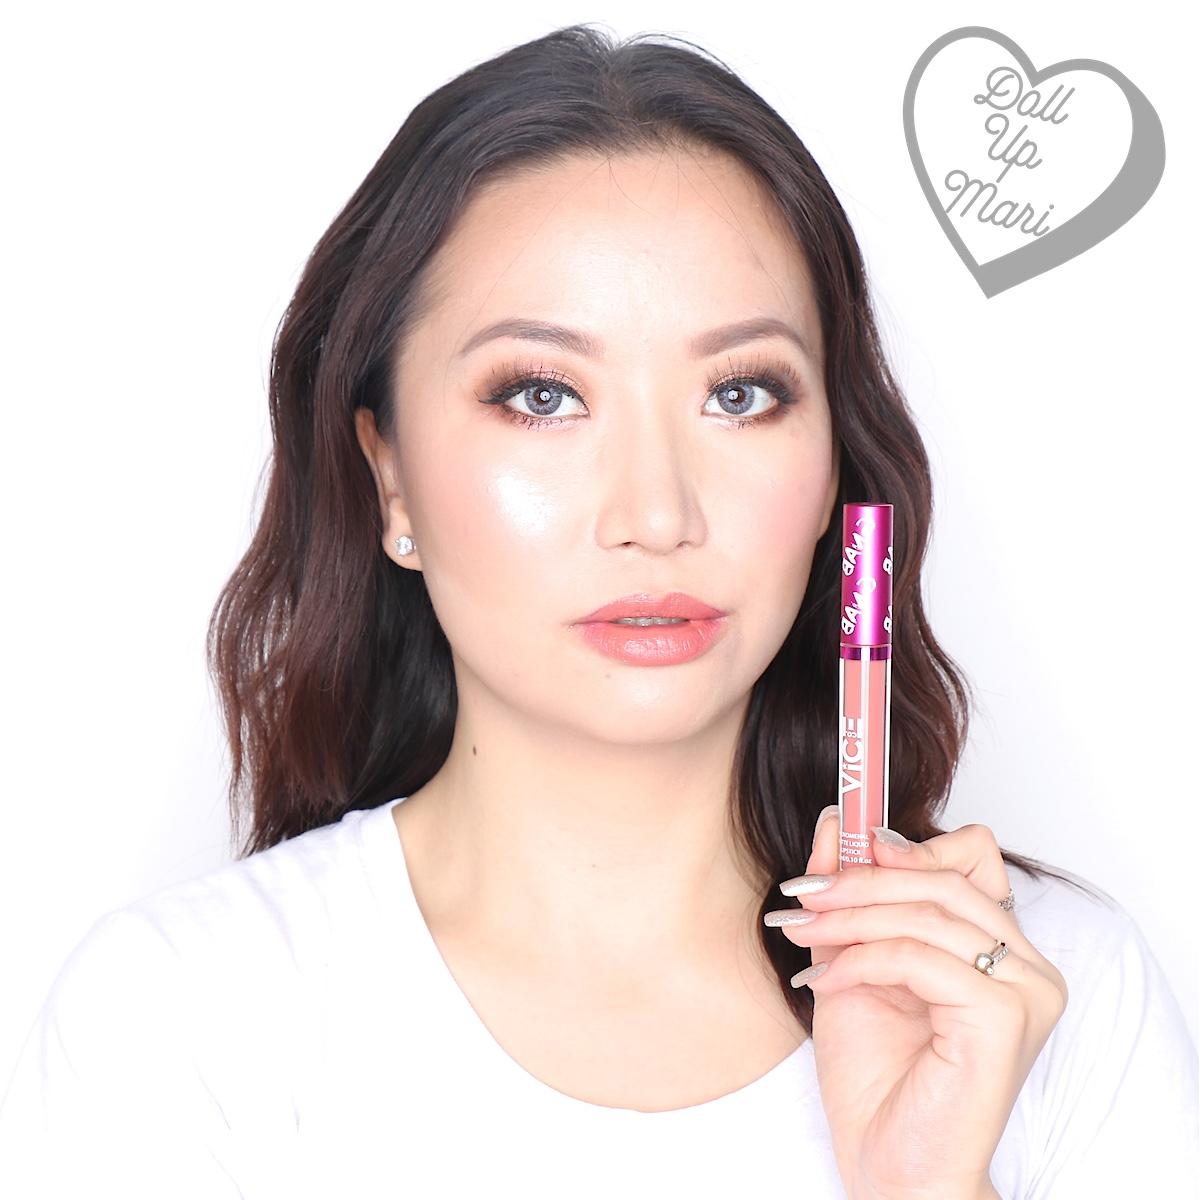 Mari wearing the Matte Liquid Lipstick of the Mowdel set of Vice X Bang Lip set collection